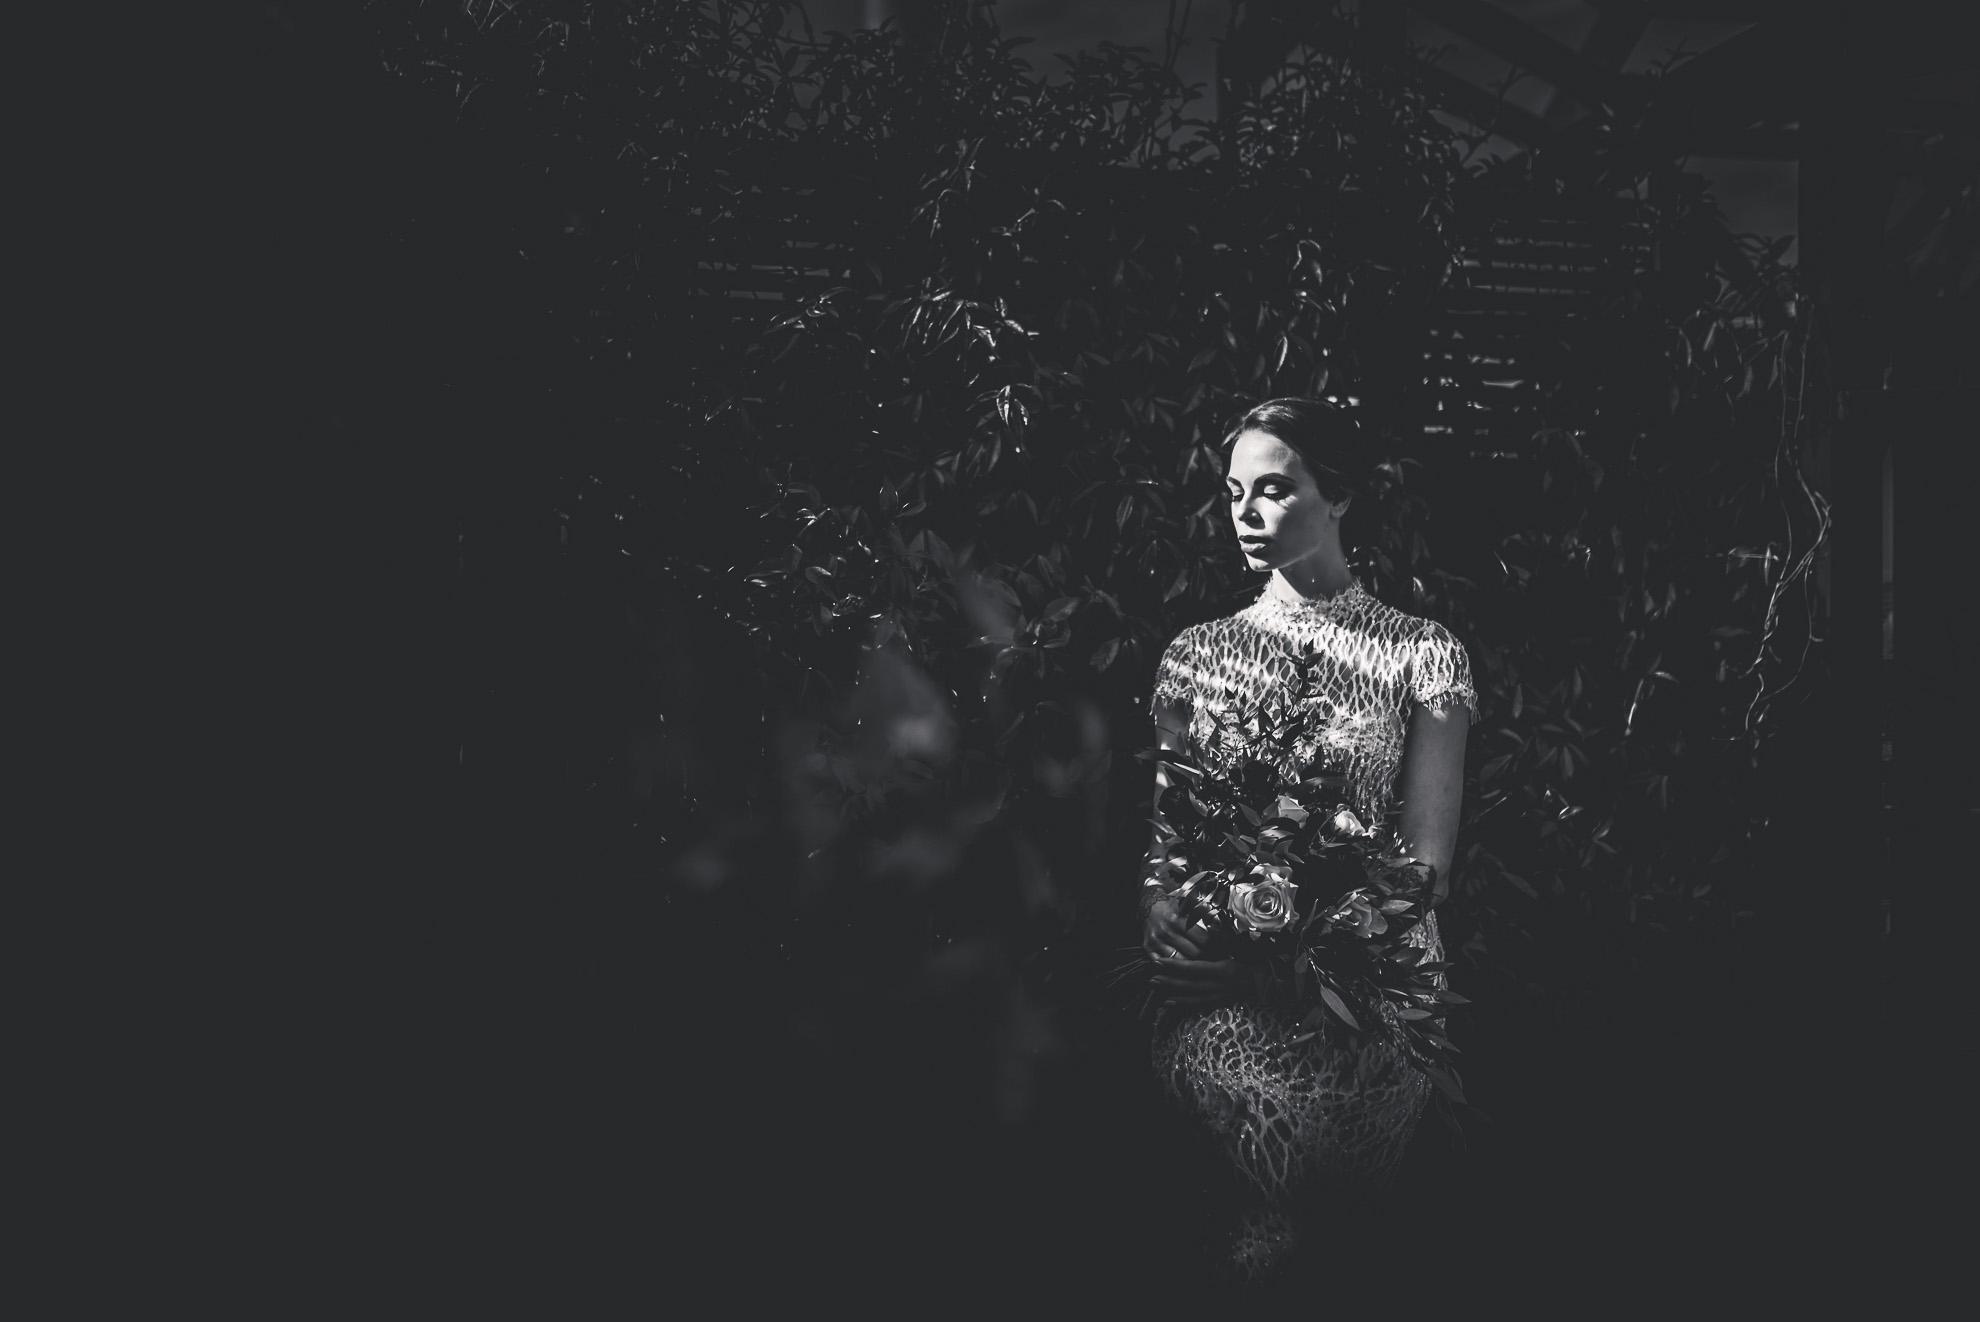 bridal portraiture in the dappled light